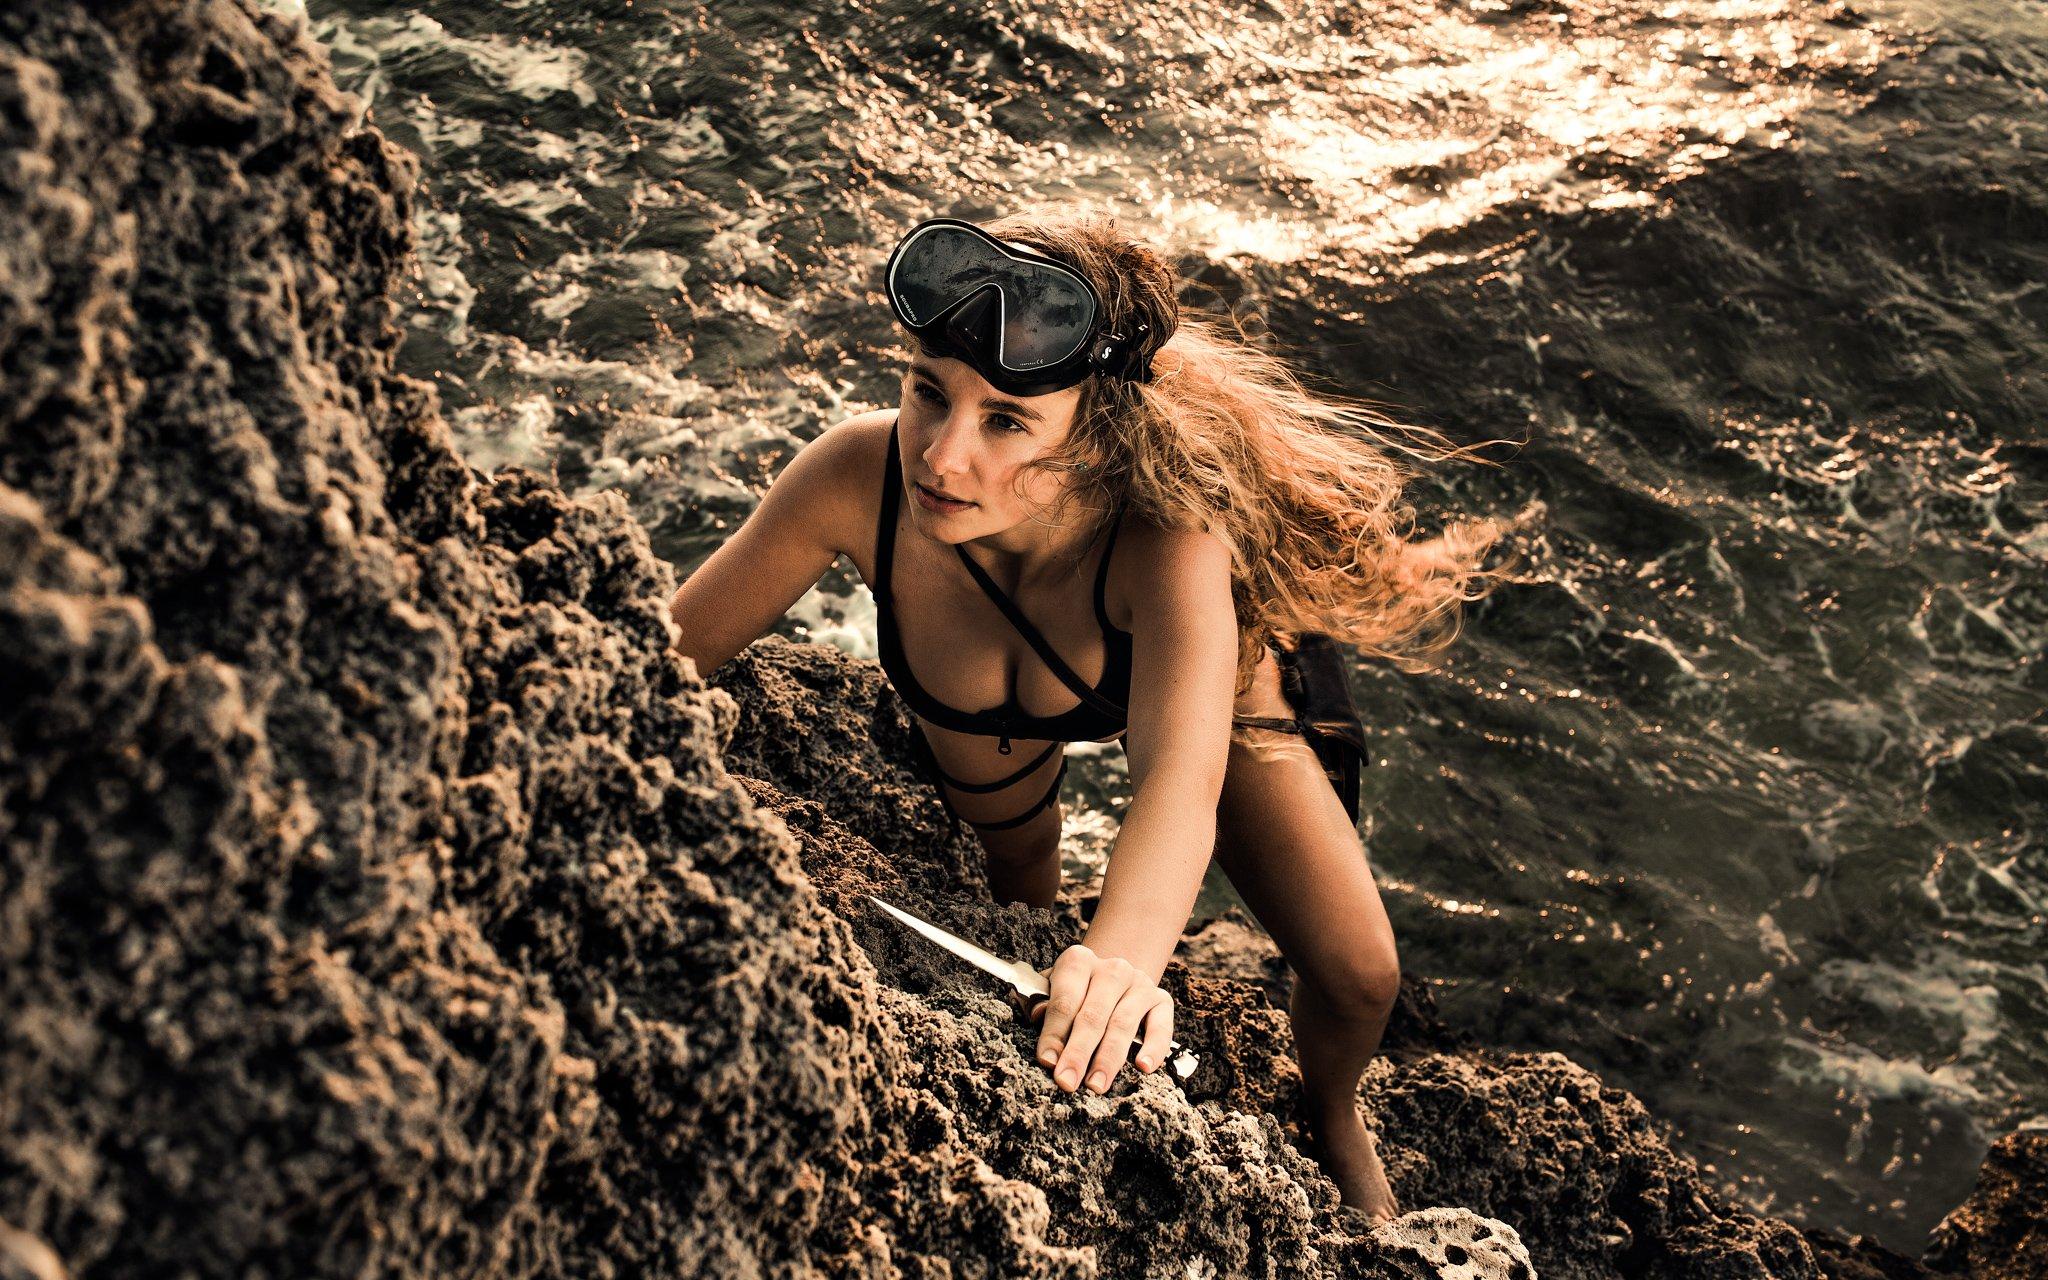 Adventure Girl – 2 – Stefanie Buma Photographer